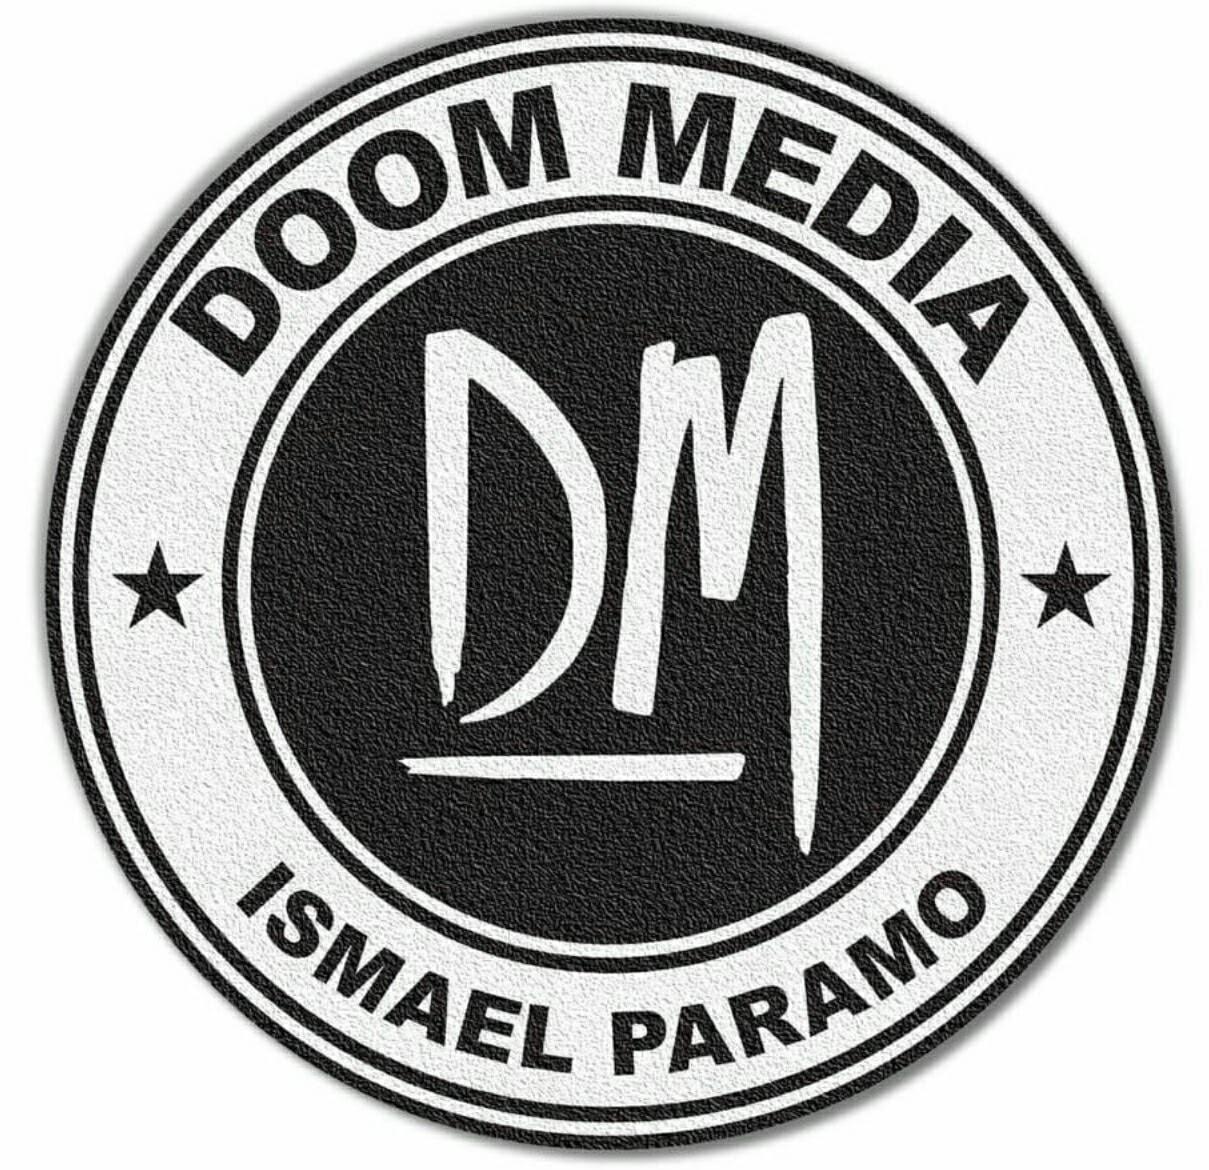 Go to Ismael Paramo's profile